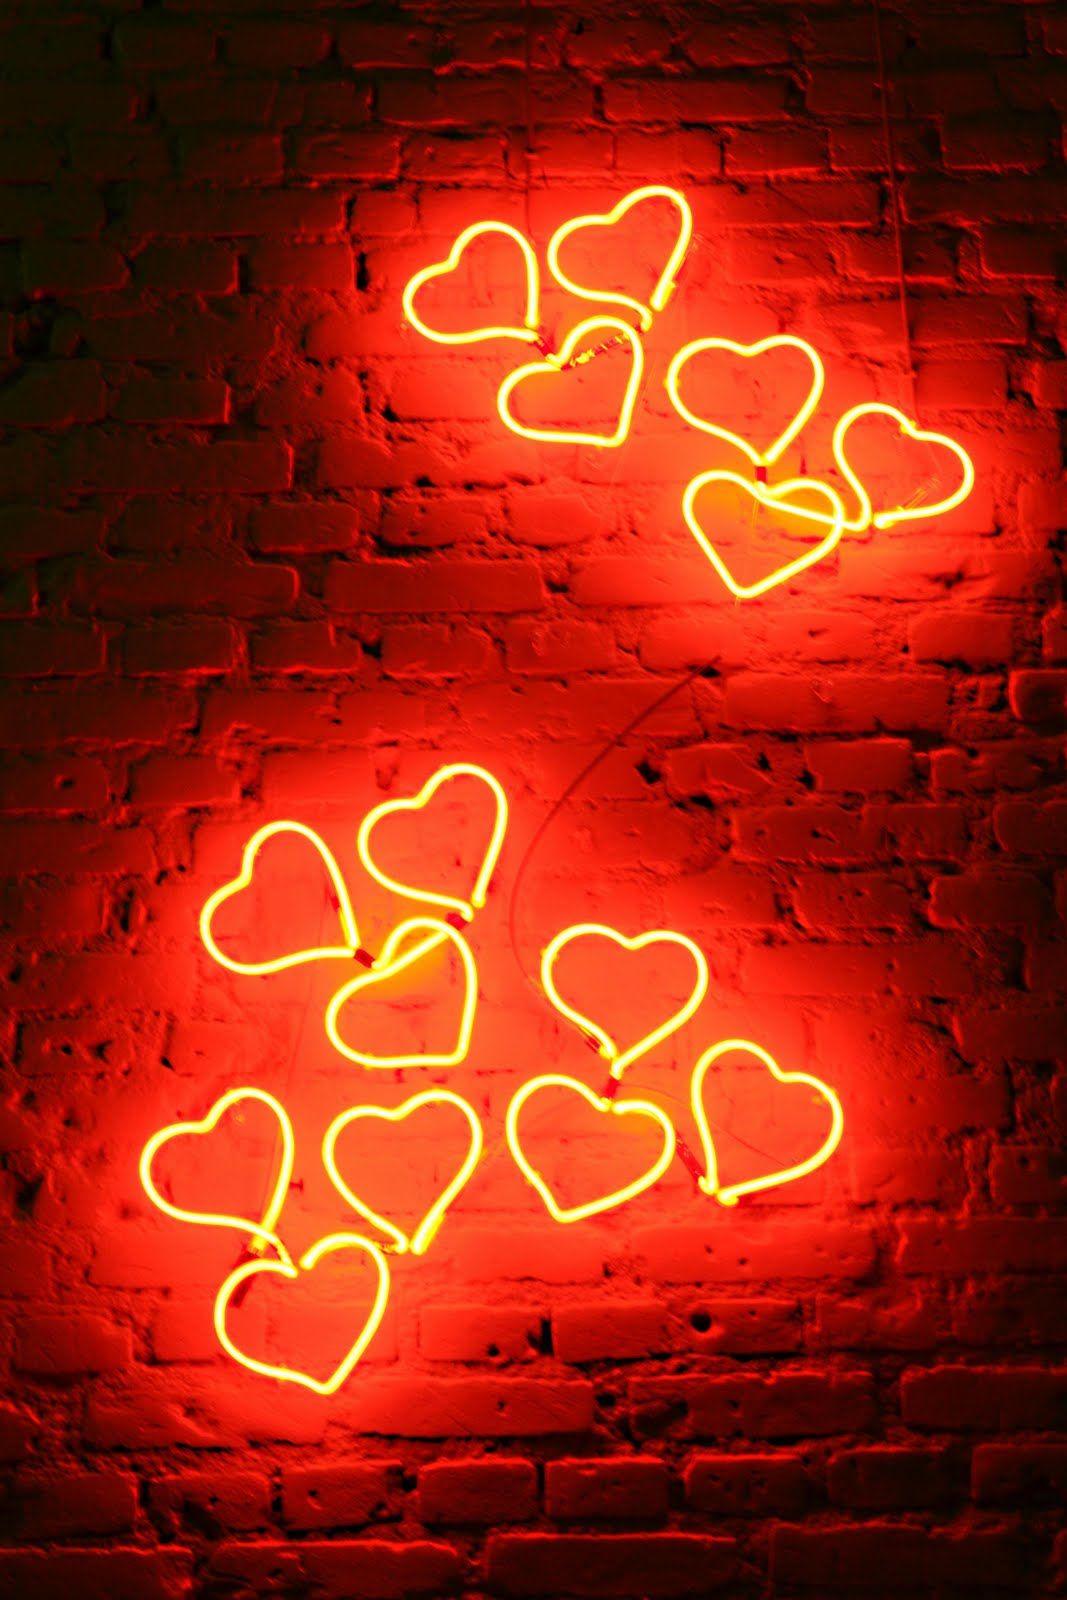 Neon Hearts Neon Decor Neon Words Neon Neon Signs